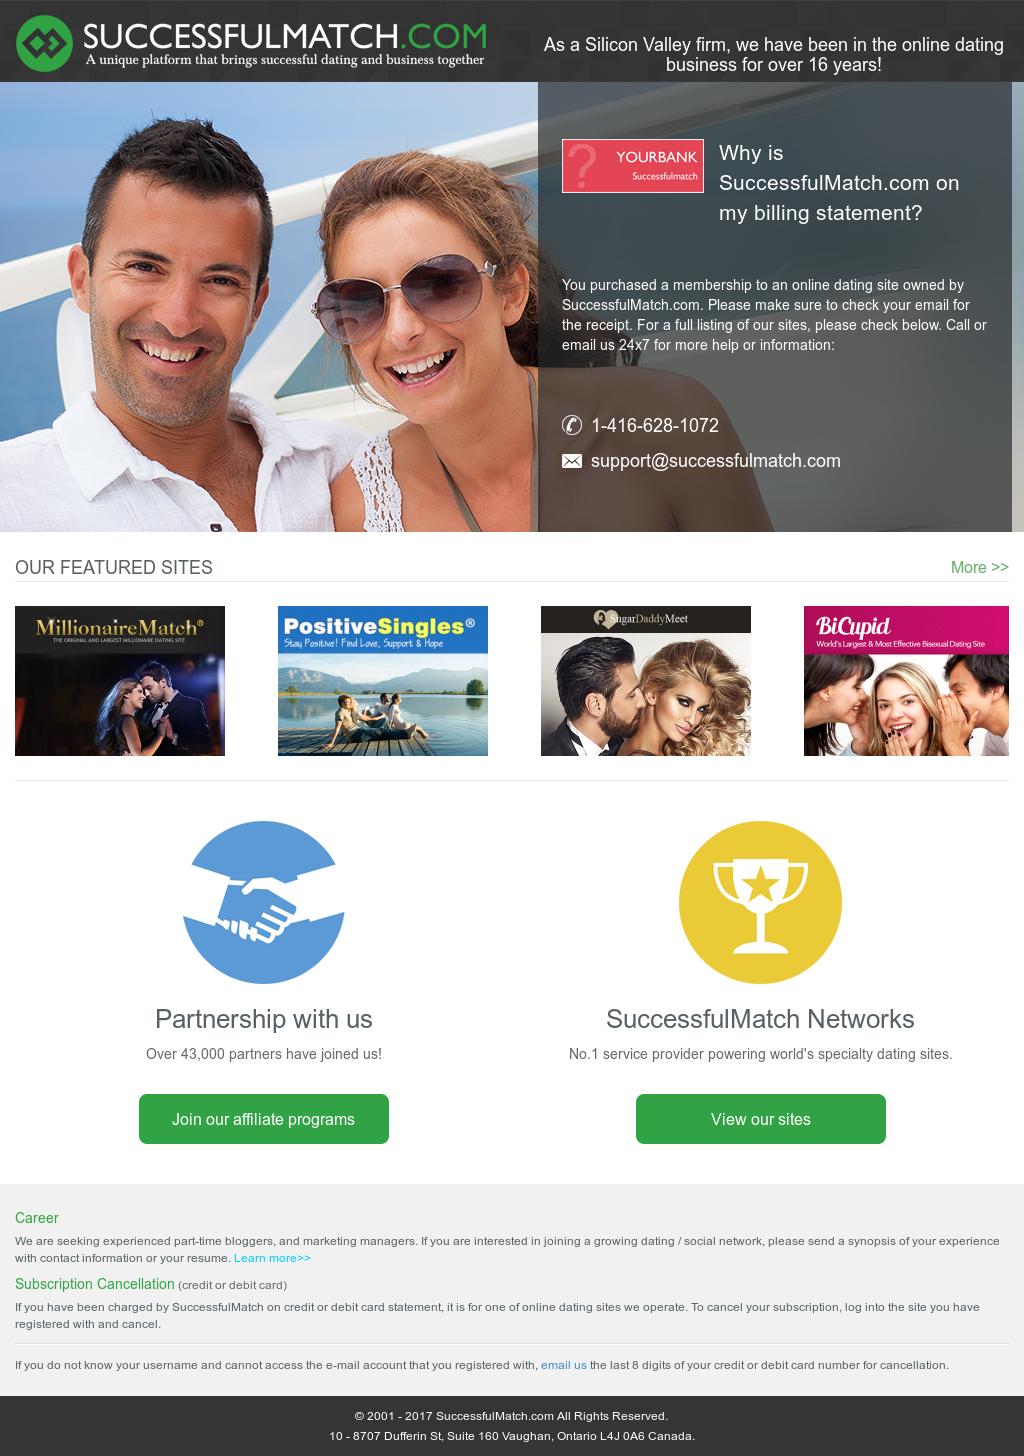 Silicon Valley online dating echte gratis dating sites